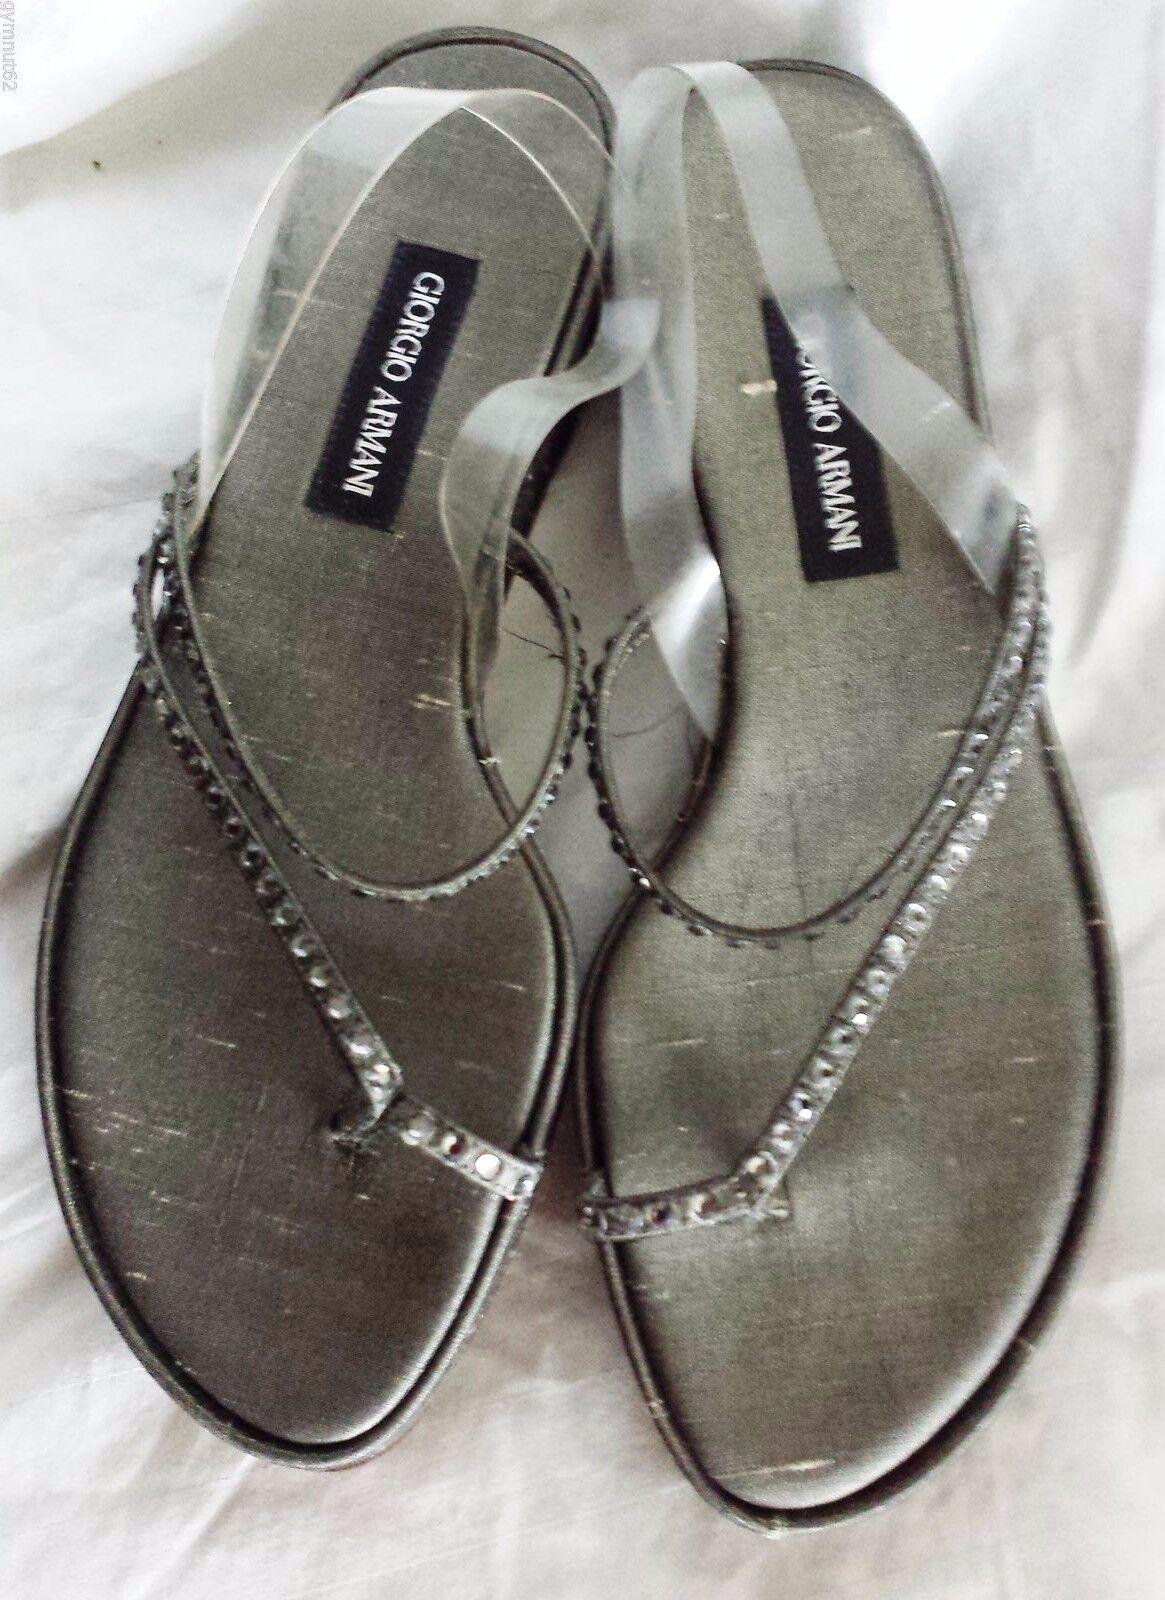 NEW Giorgio Armani Sandals 5-1 2 shoes 36 Platinum Rhinestone 5.5